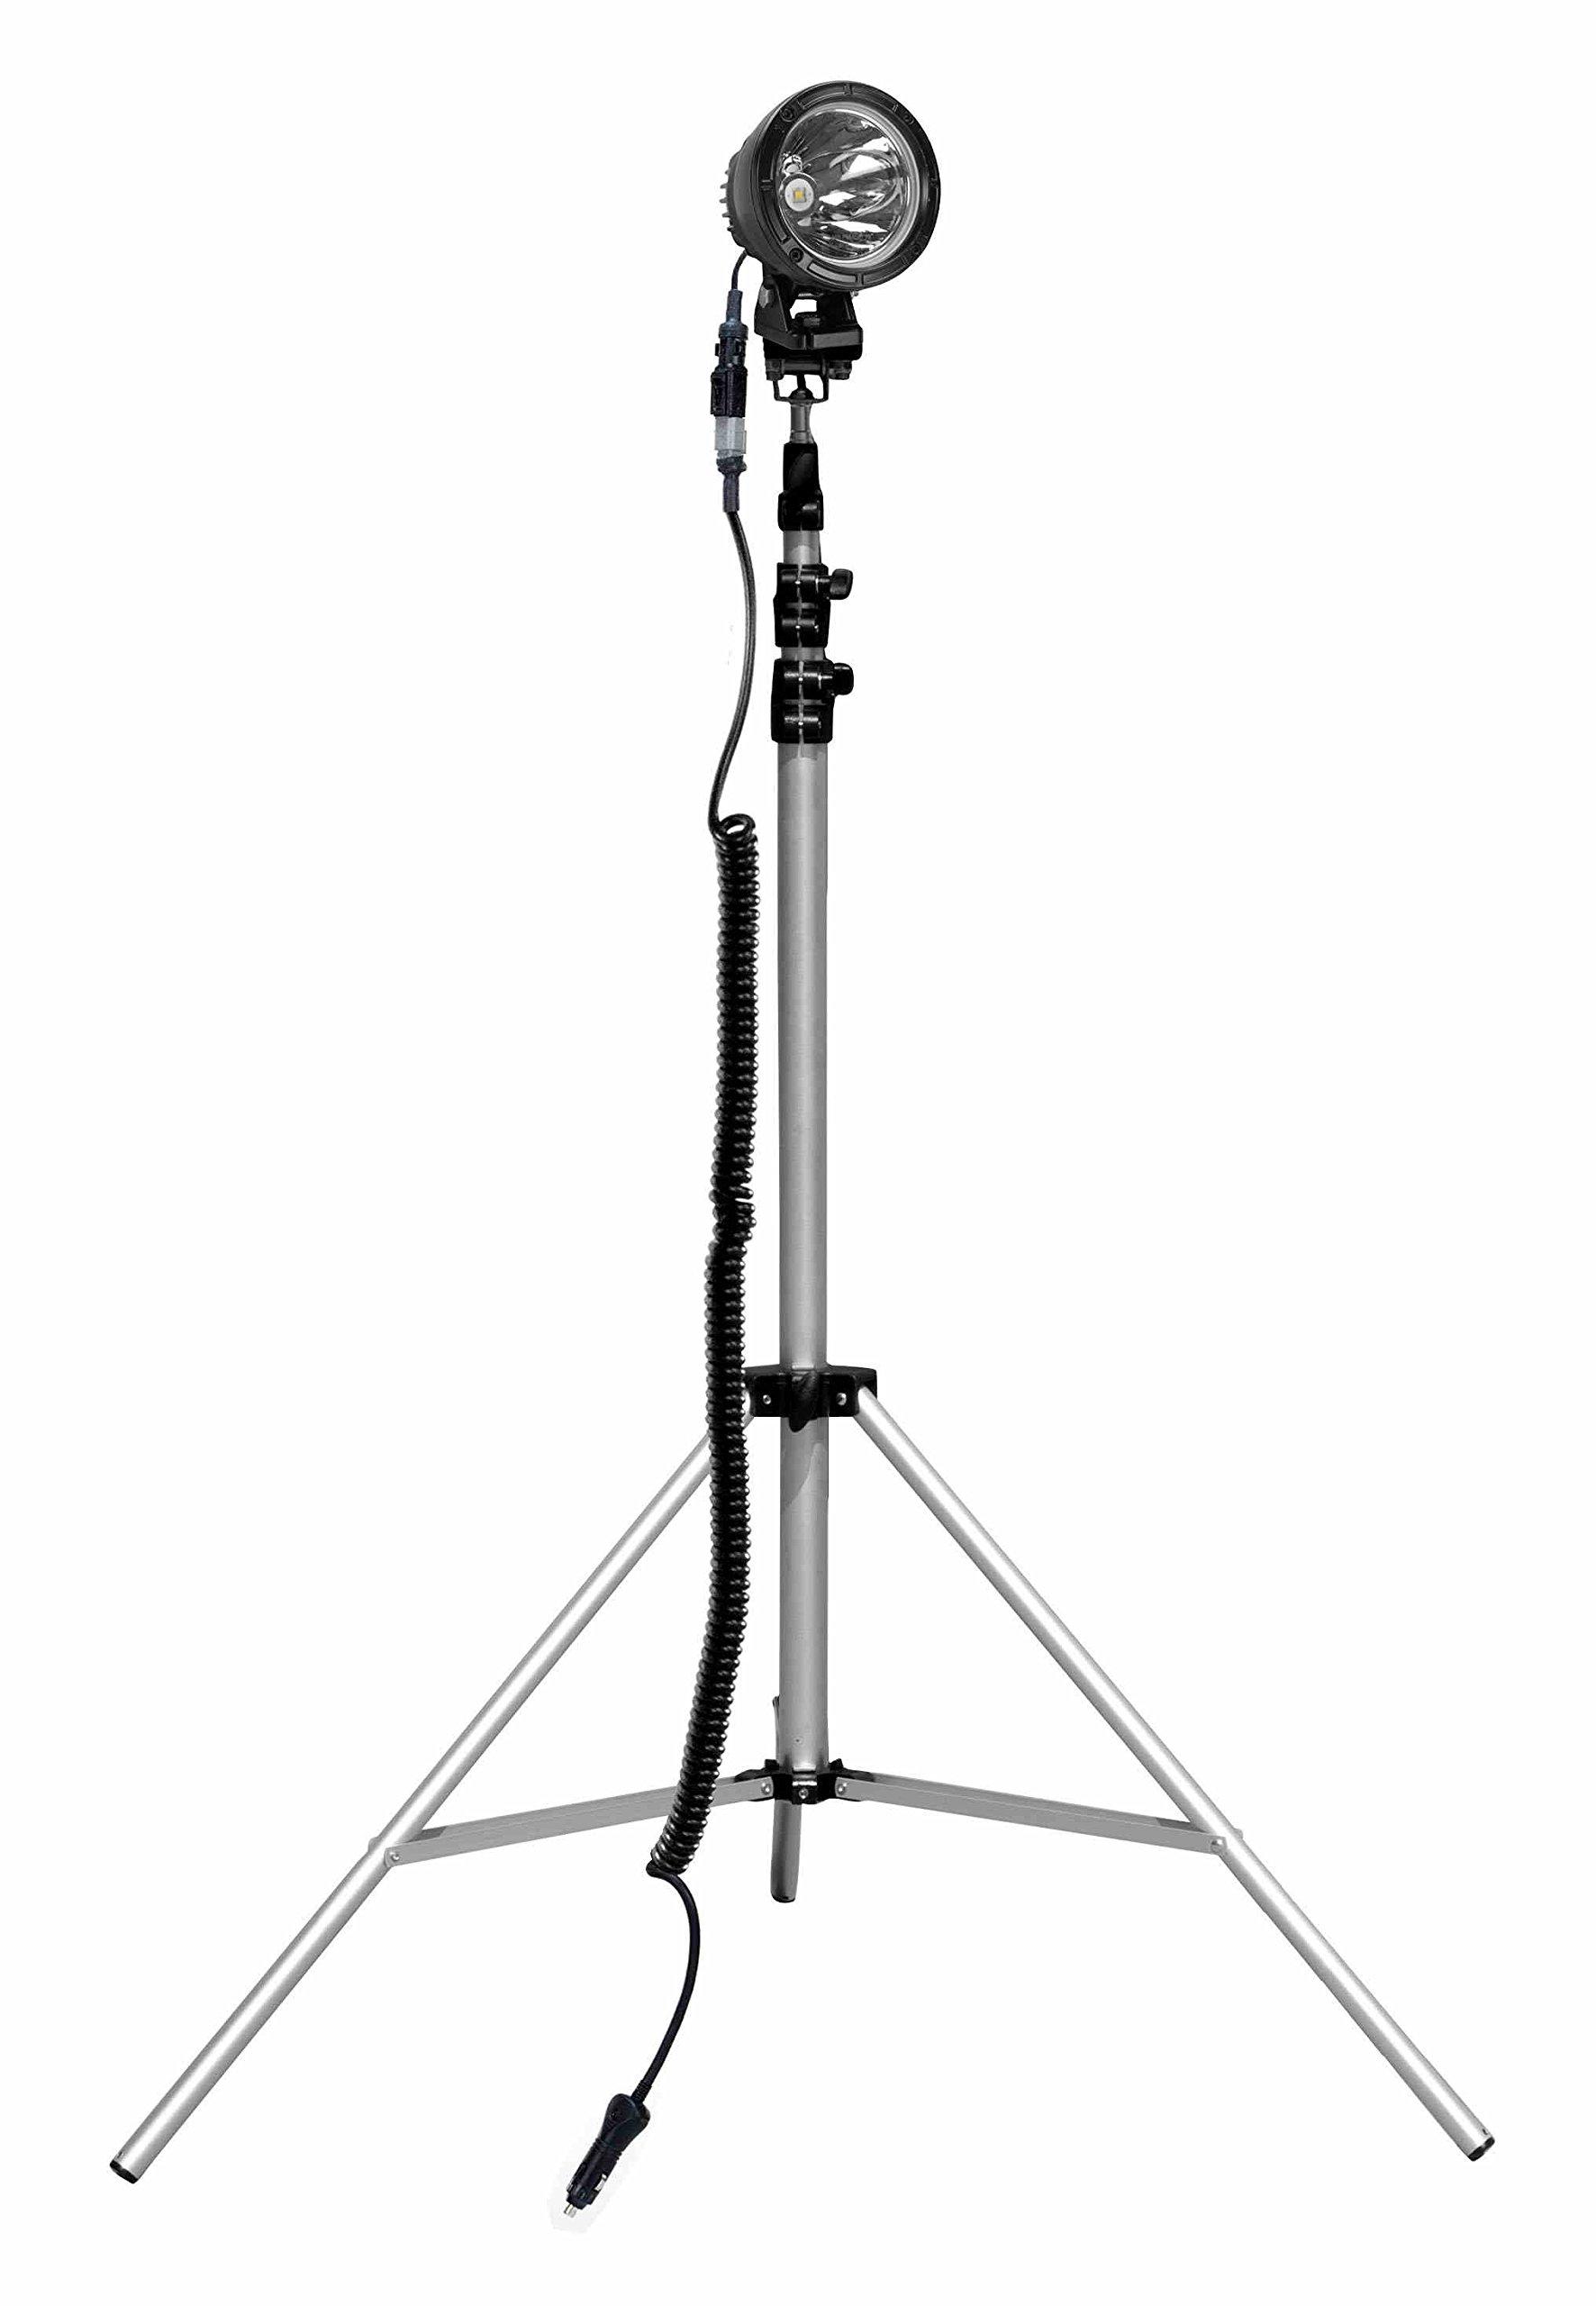 25W Dual LED Work Light w/ Adjustable Tripod Mount - 2750 Lumens - 3.5' to 10' Adjustable Height